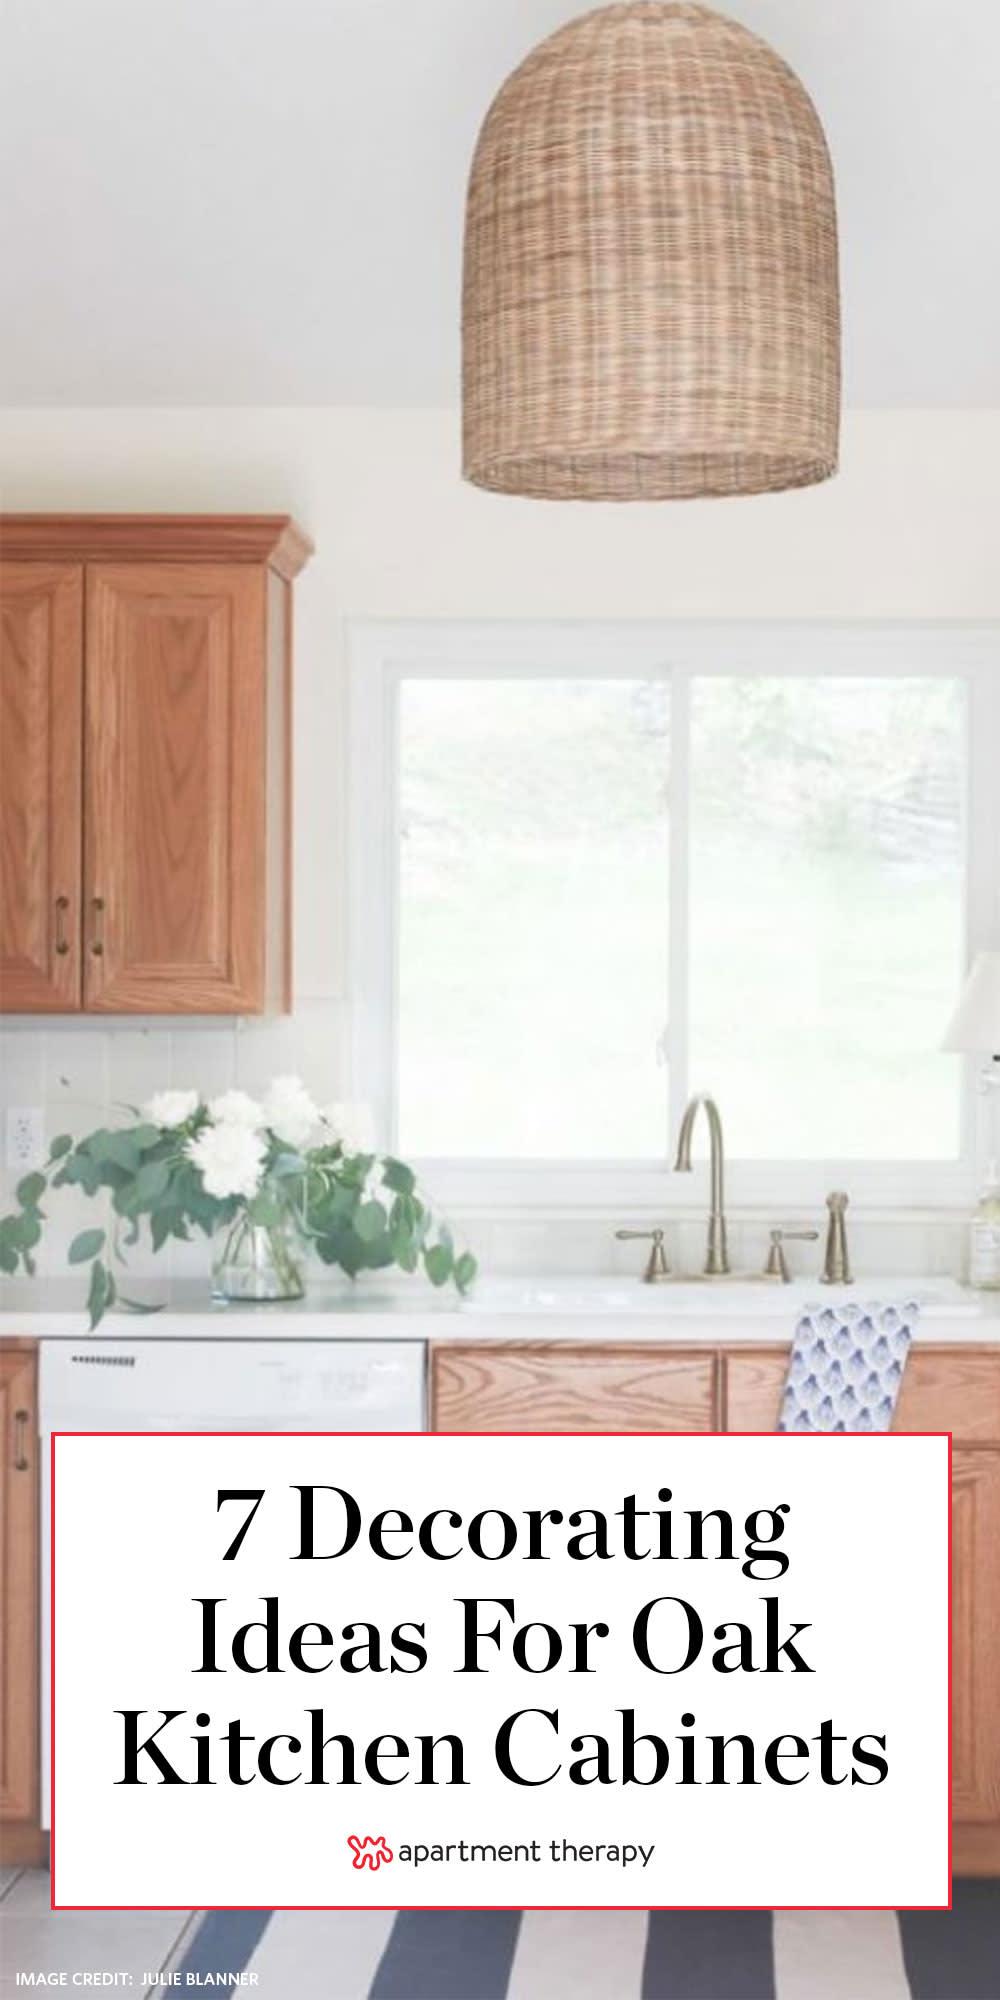 Rental Kitchen Decor Ideas Oak Wood Finish Cabinets Apartment Therapy